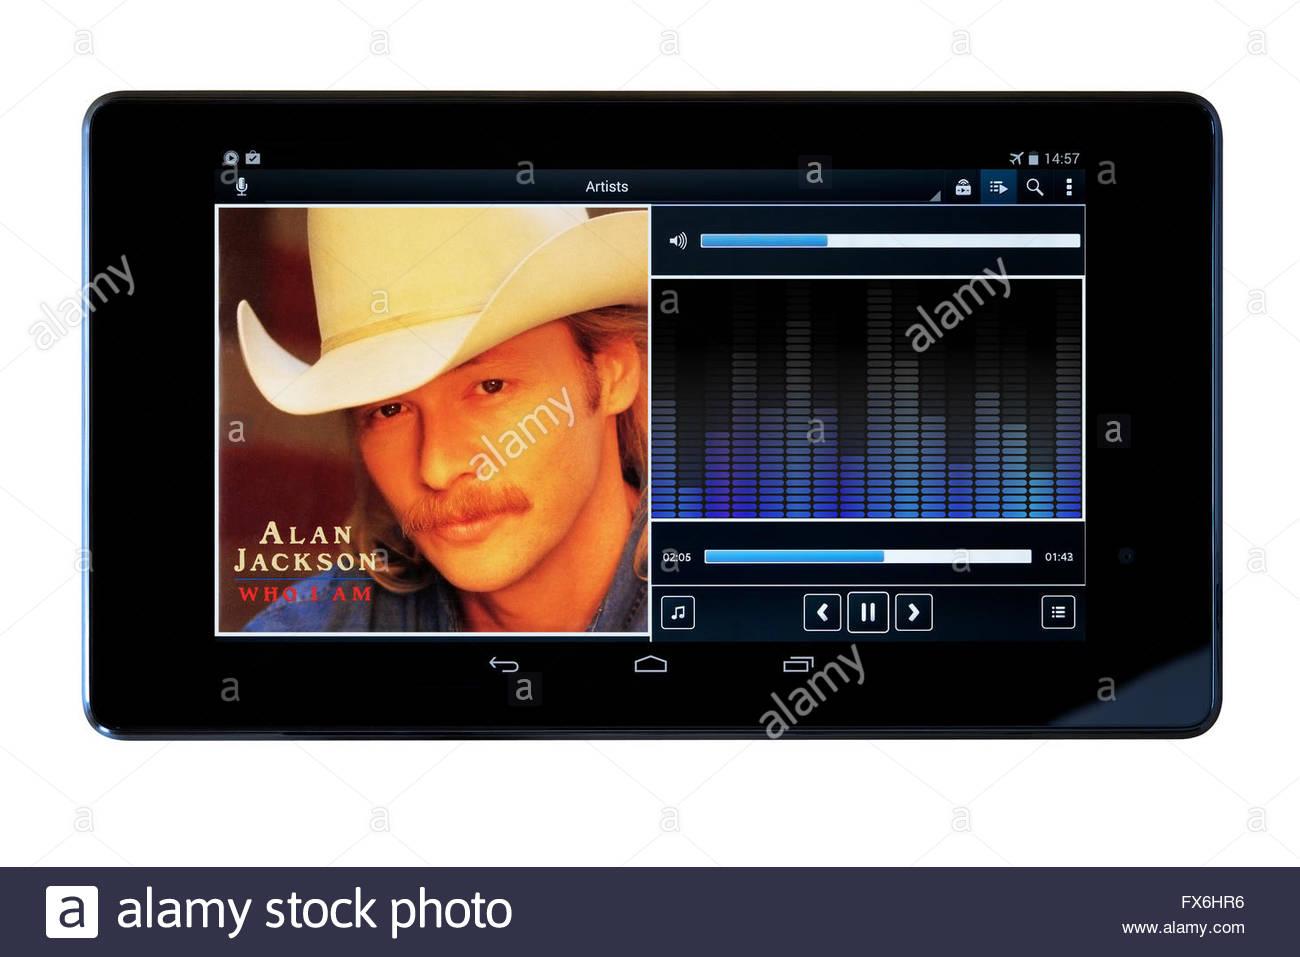 Alan Jackson Who Am I album, MP3 album art on PC tablet, England - Stock Image